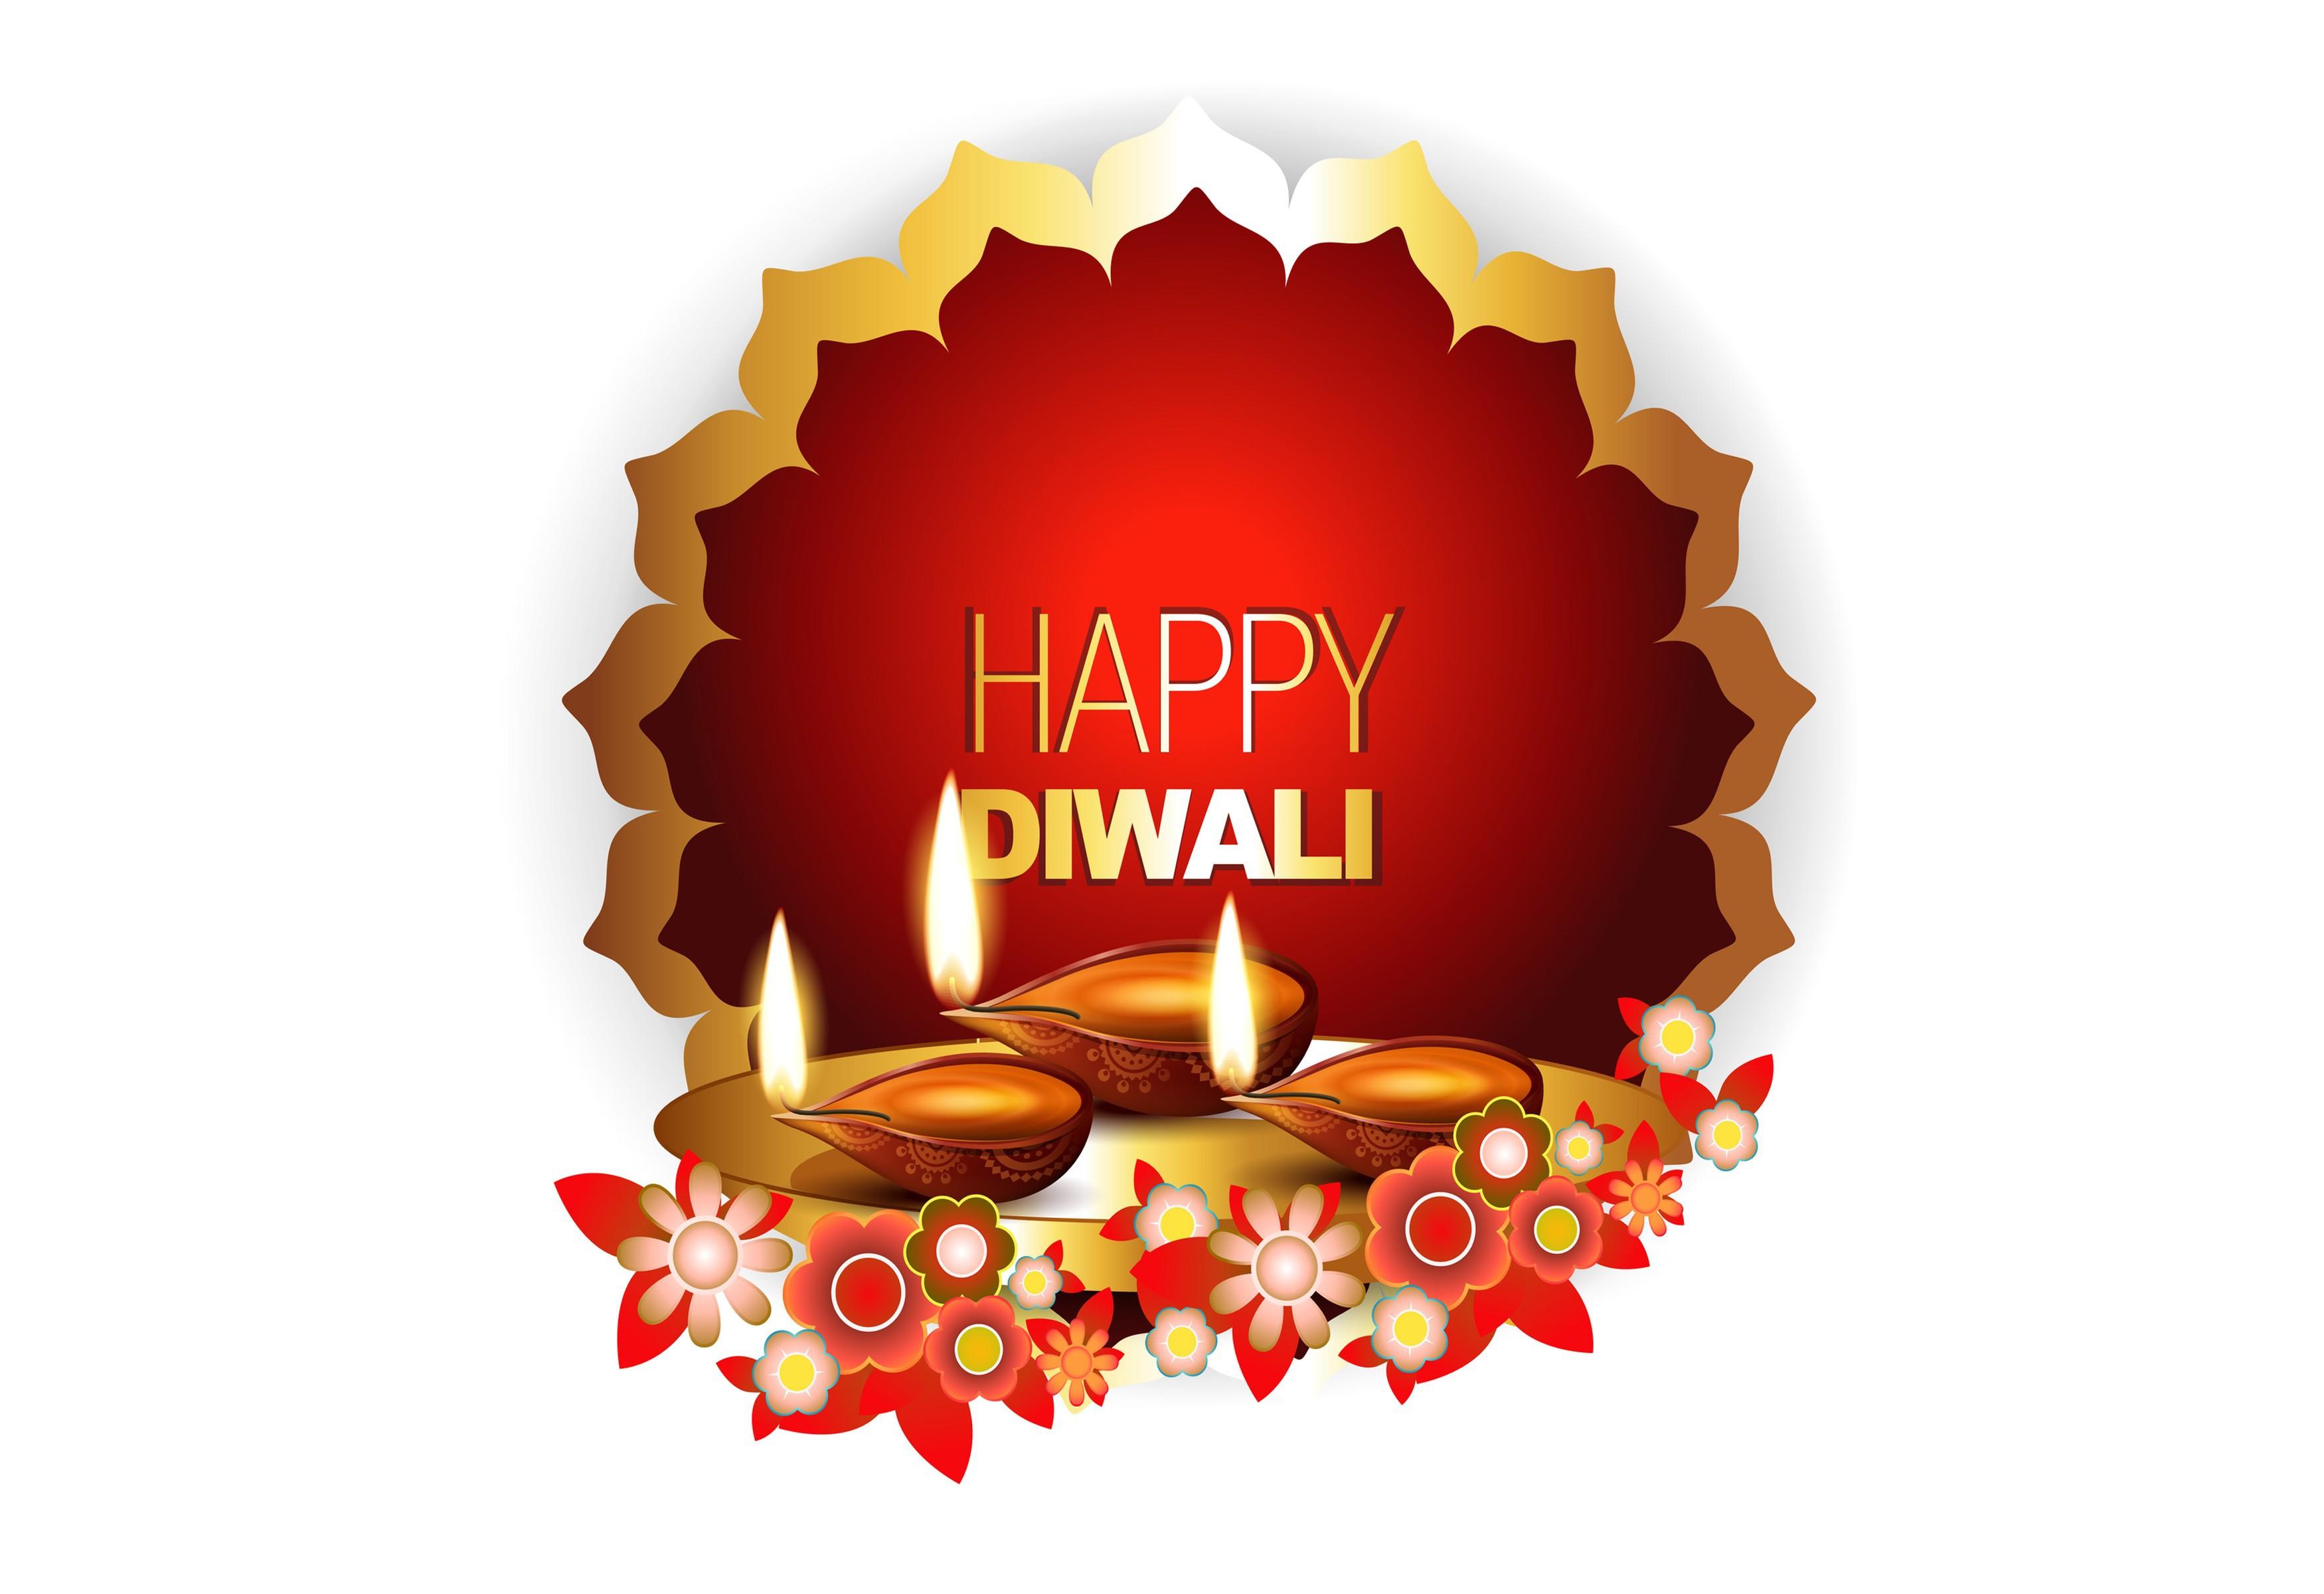 Diwali HD PNG Transparent Diwali HD.PNG Images..